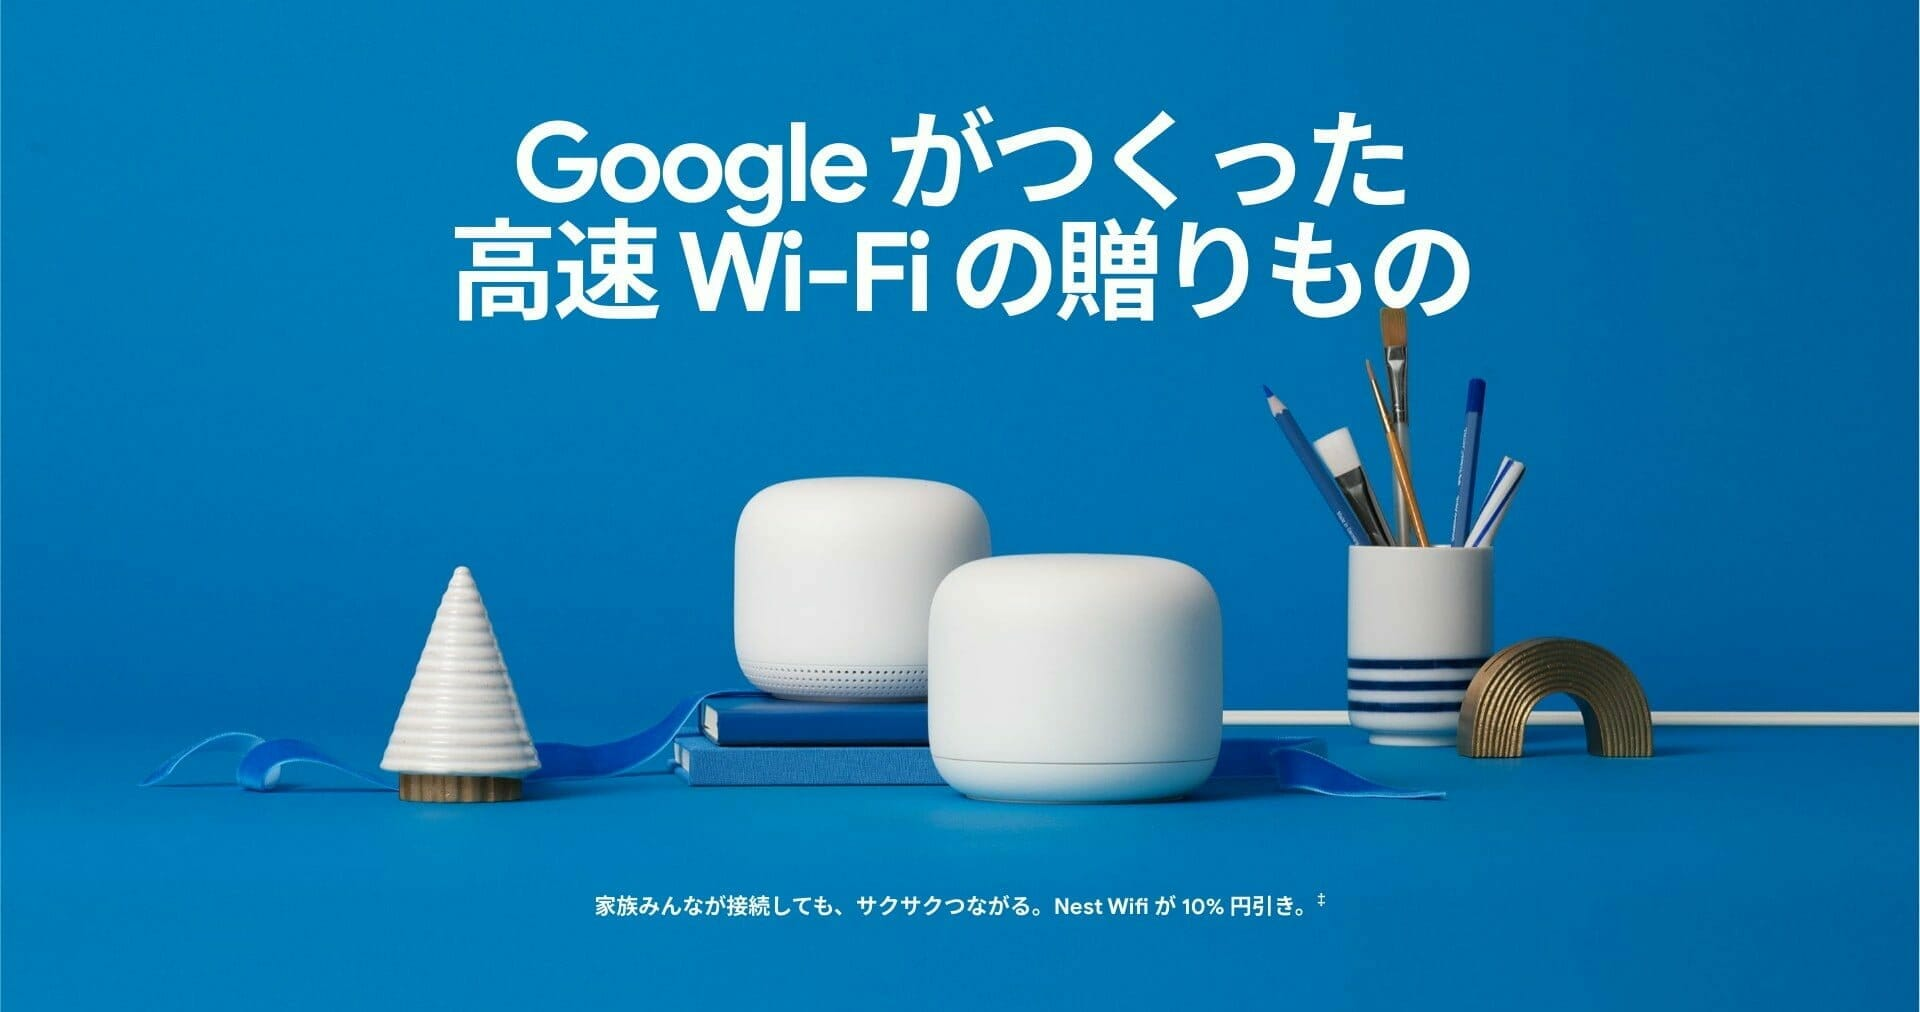 Google ホリデー デザイン:メッシュ WiFi ルーター「Google Nest WiFi」